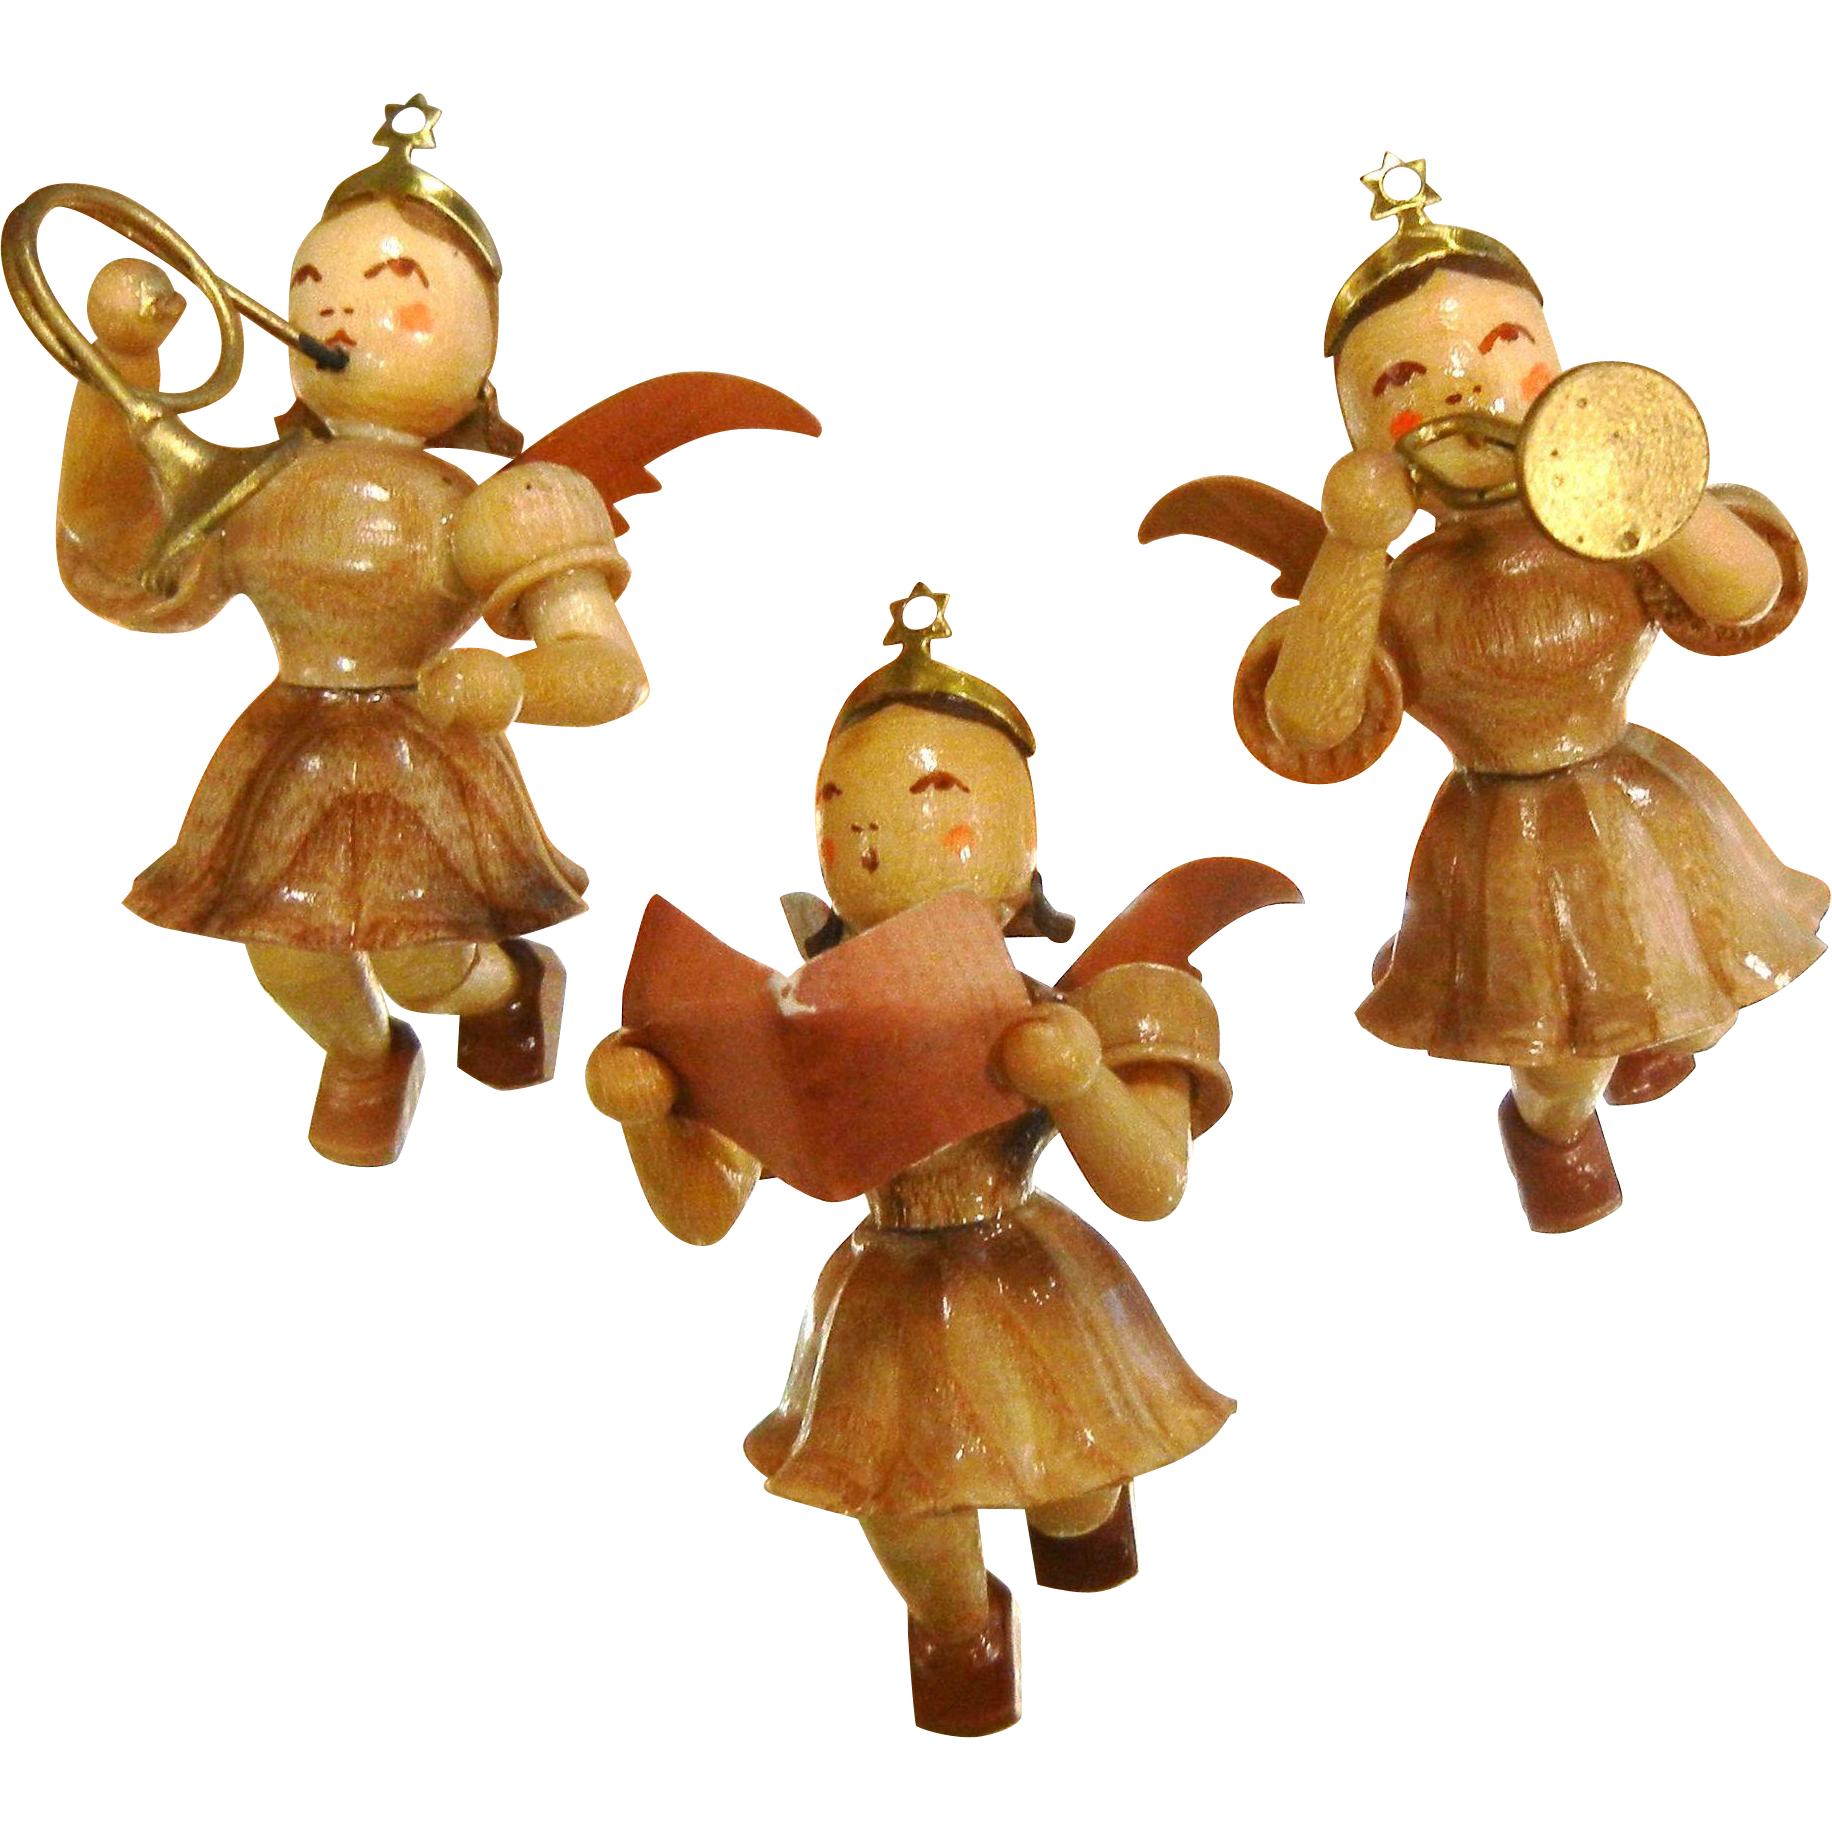 Set of three vintage german made wooden angel ornaments